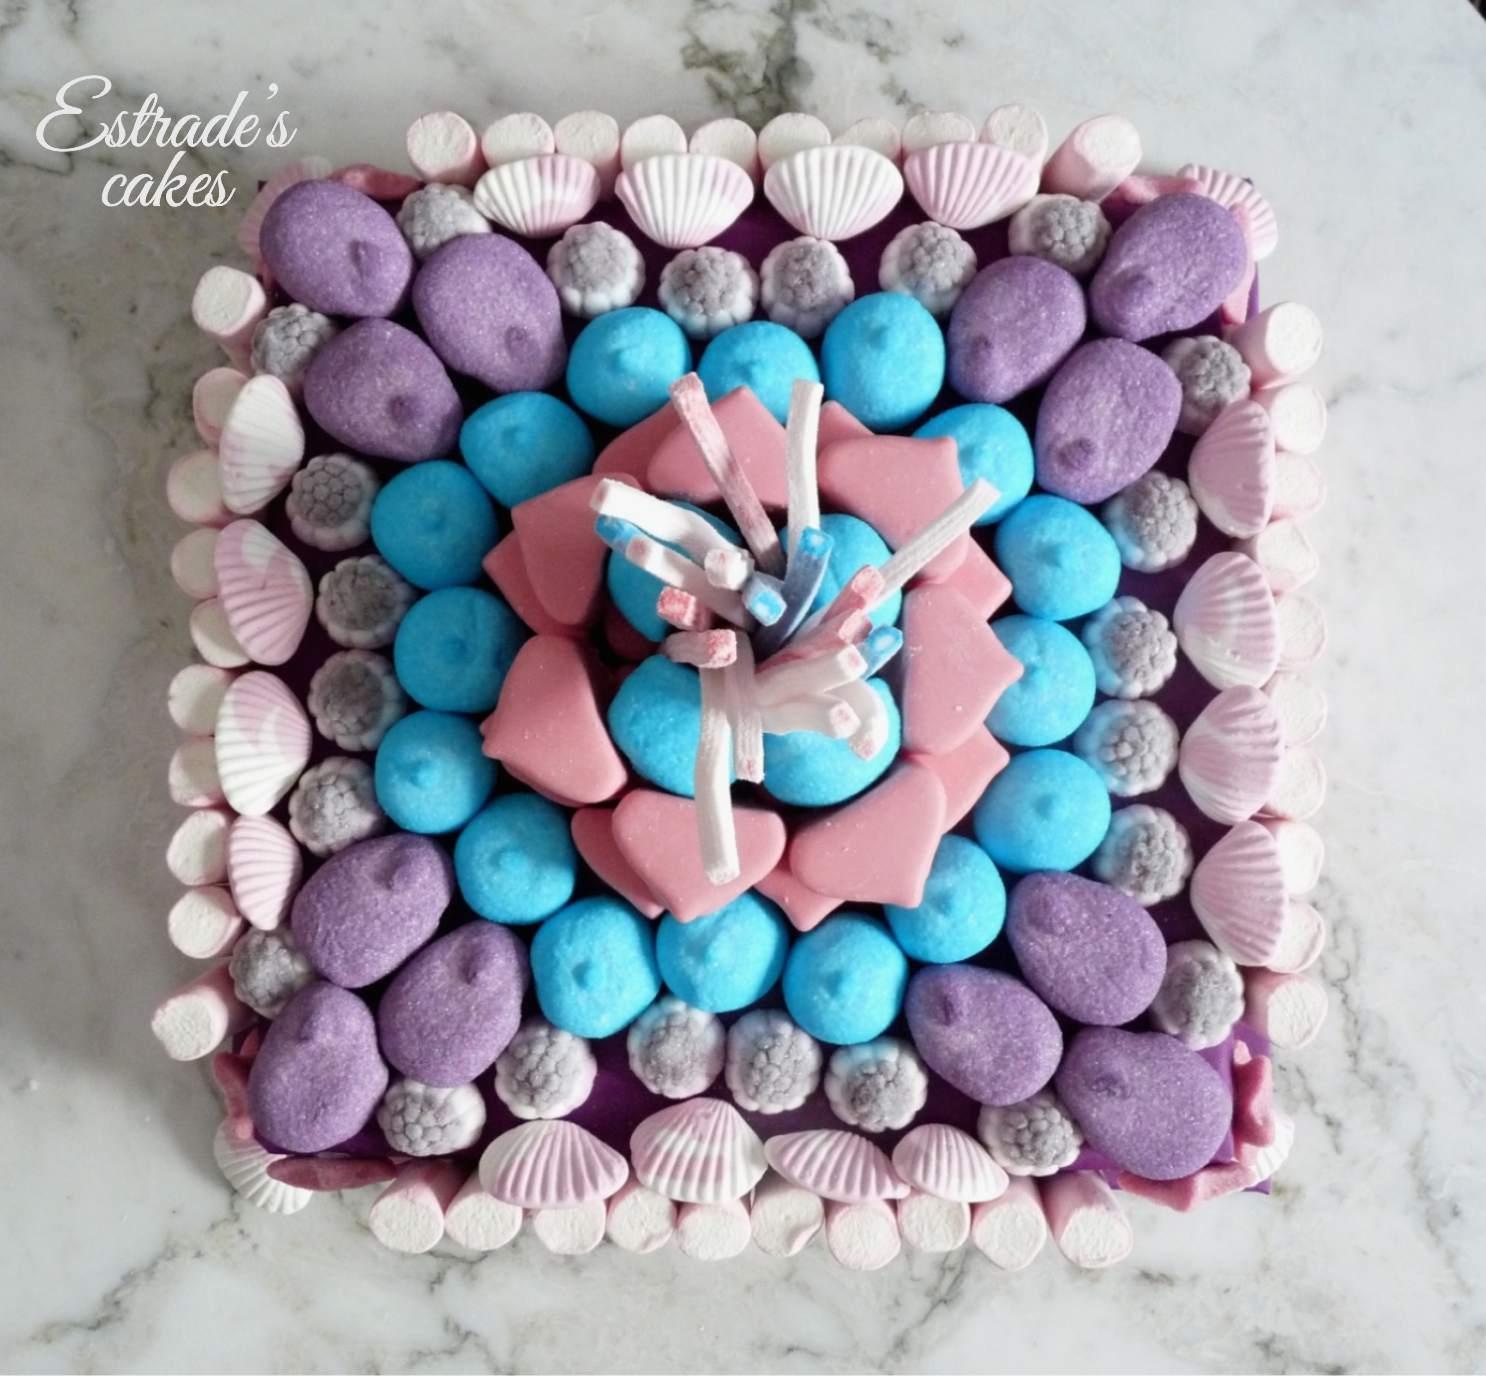 tarta de chuches Violetta - 2